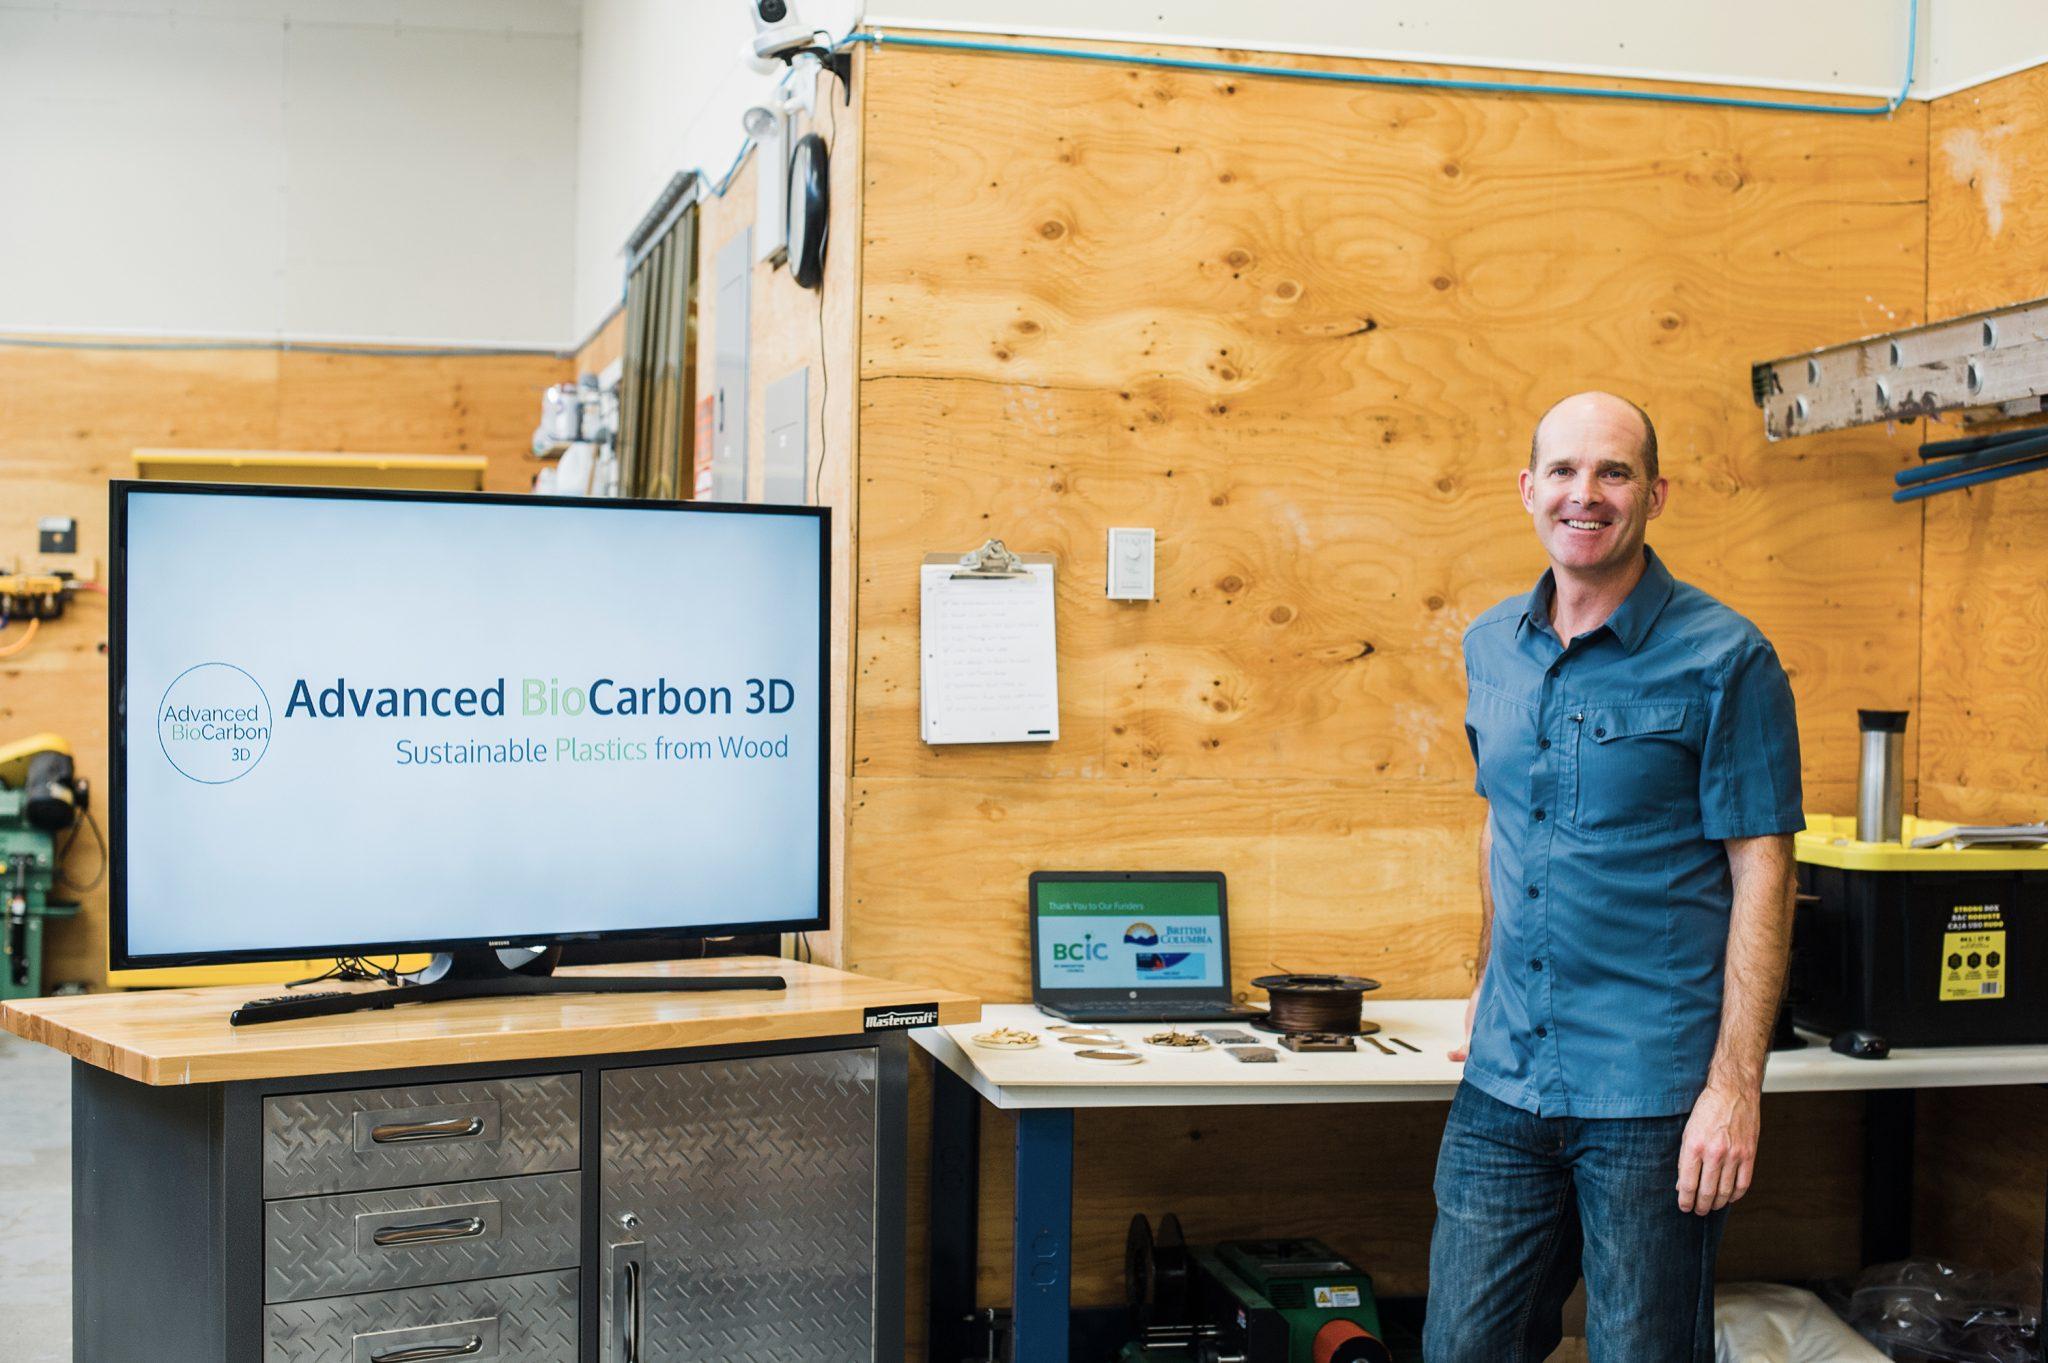 Darrel Fry مدیر عامل شرکت ABC3D، در آزمایشگاه MIDAS Fab